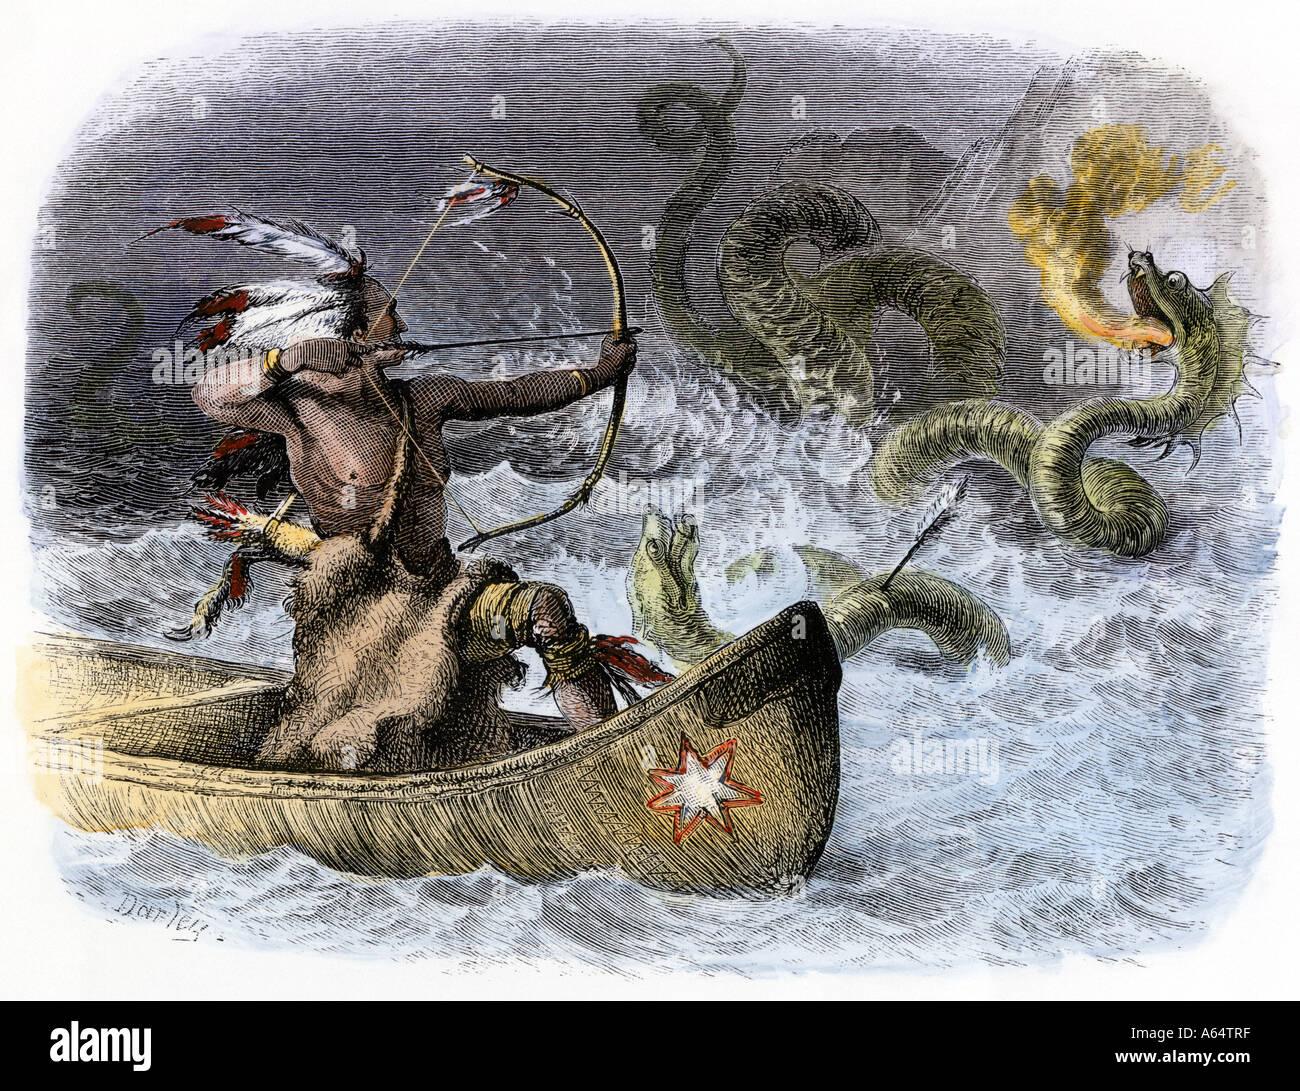 Hiawatha in a canoe aiming his arrow at the sea dragon - Stock Image